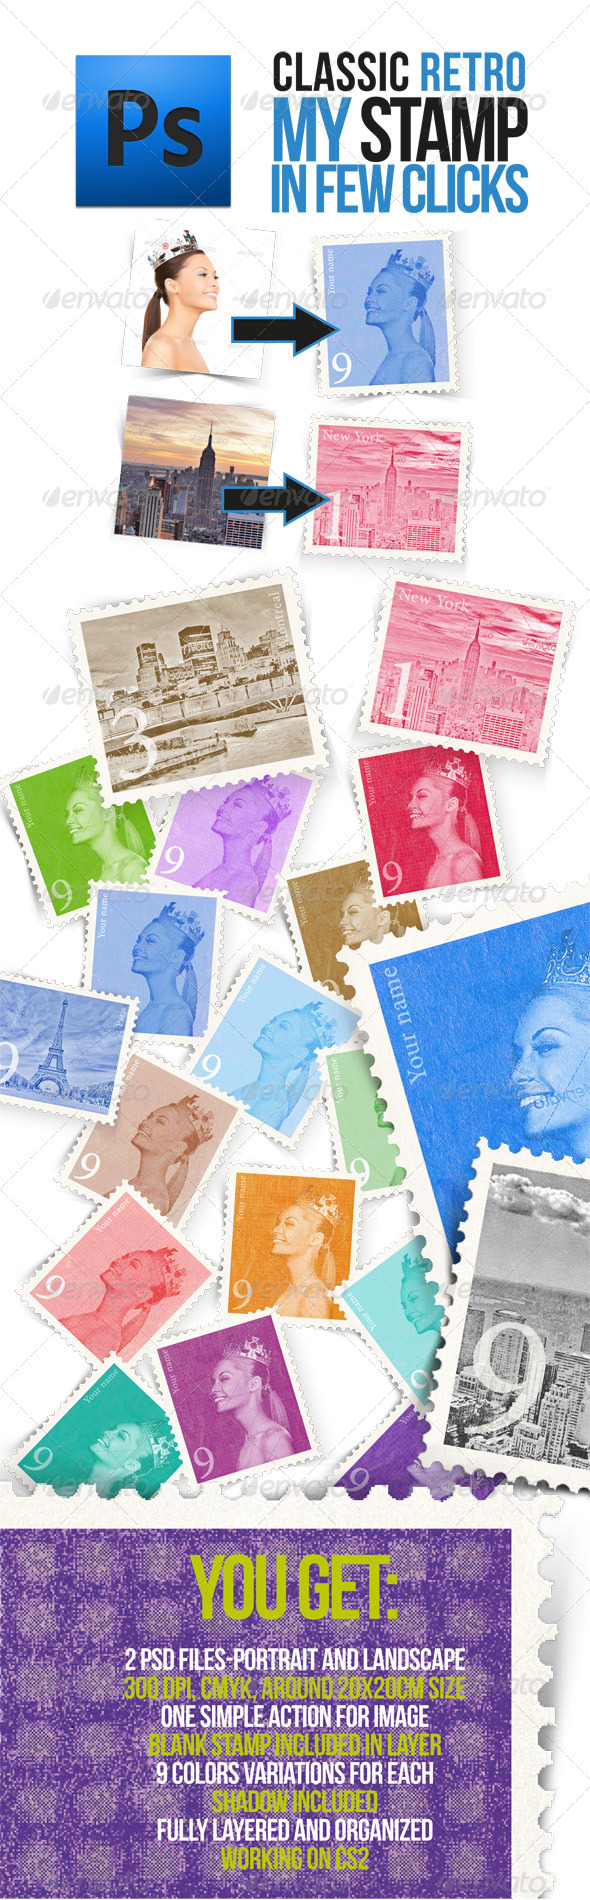 GraphicRiver Retro Postage Stamp Template 5515256